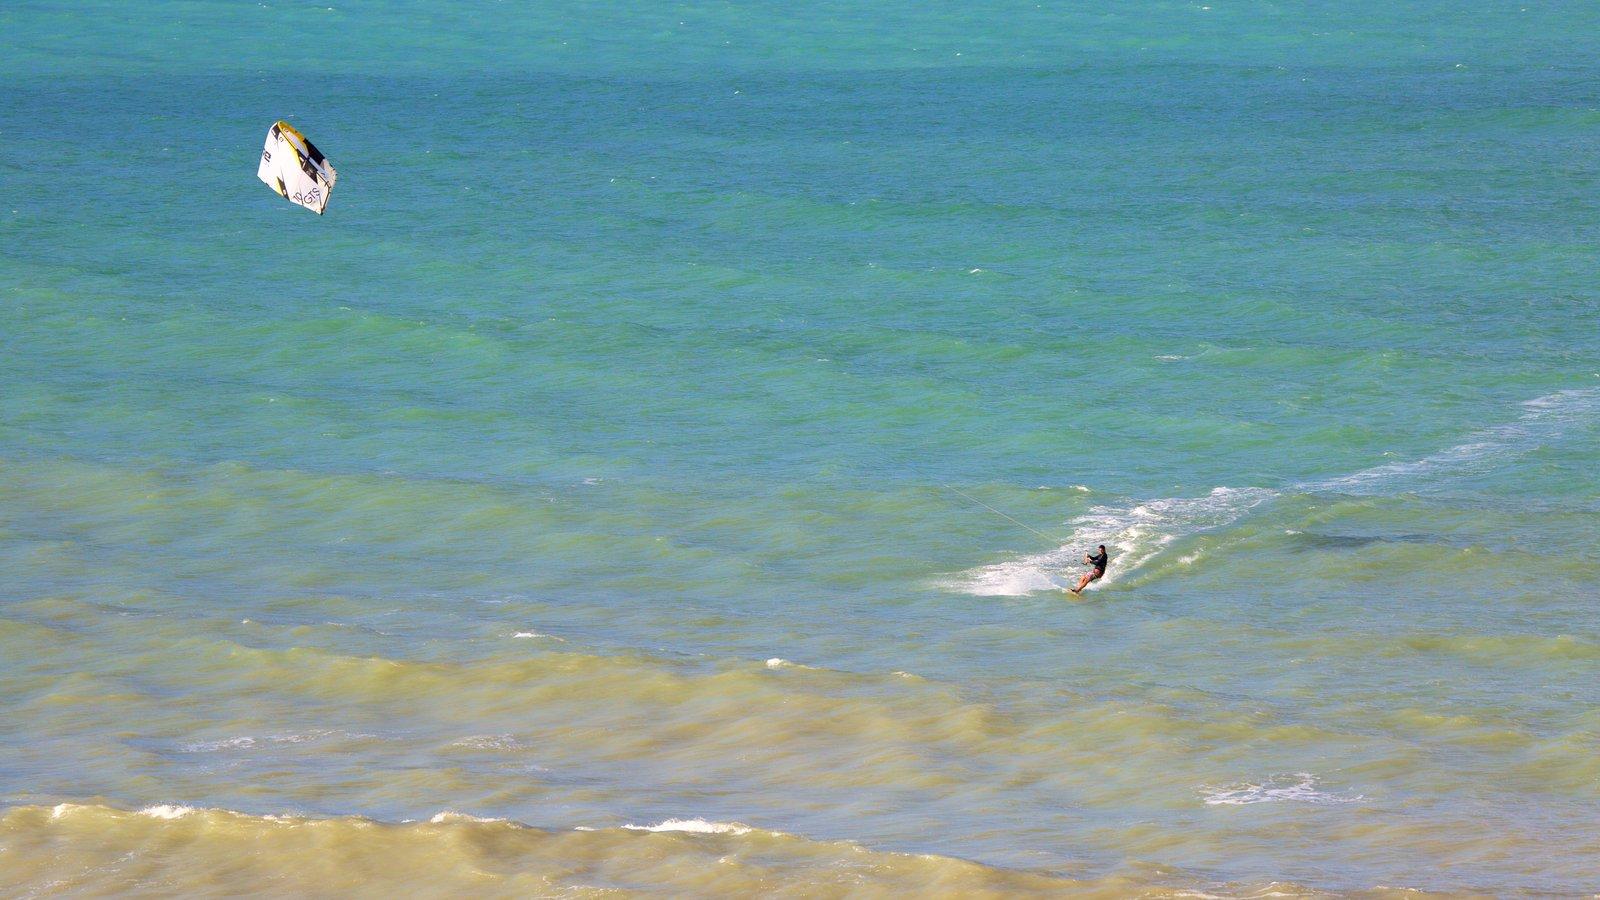 Pipa caracterizando windsurfe e paisagens litorâneas